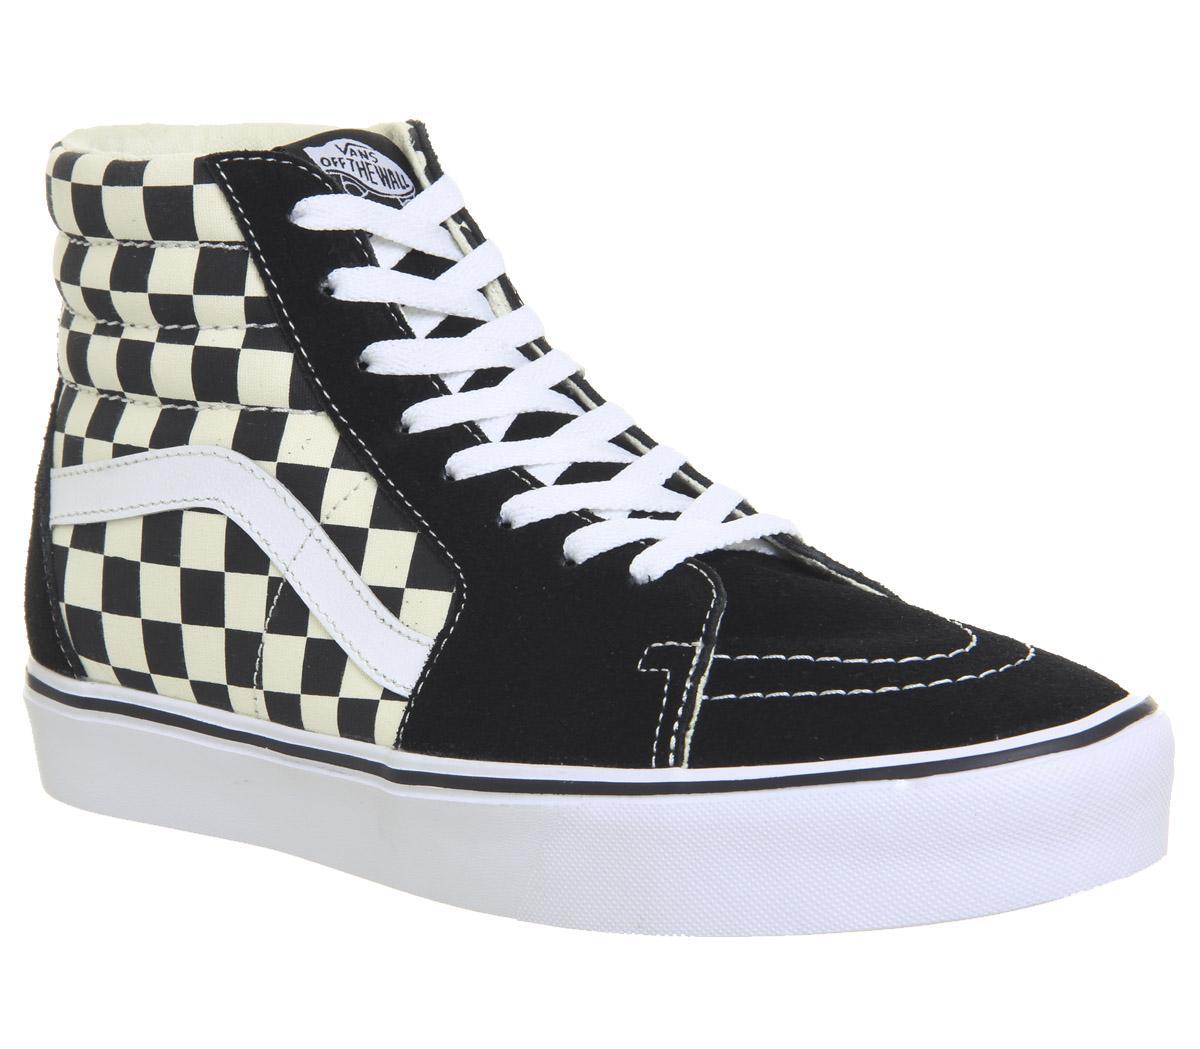 Vans Sk8 Hi Lite Black White